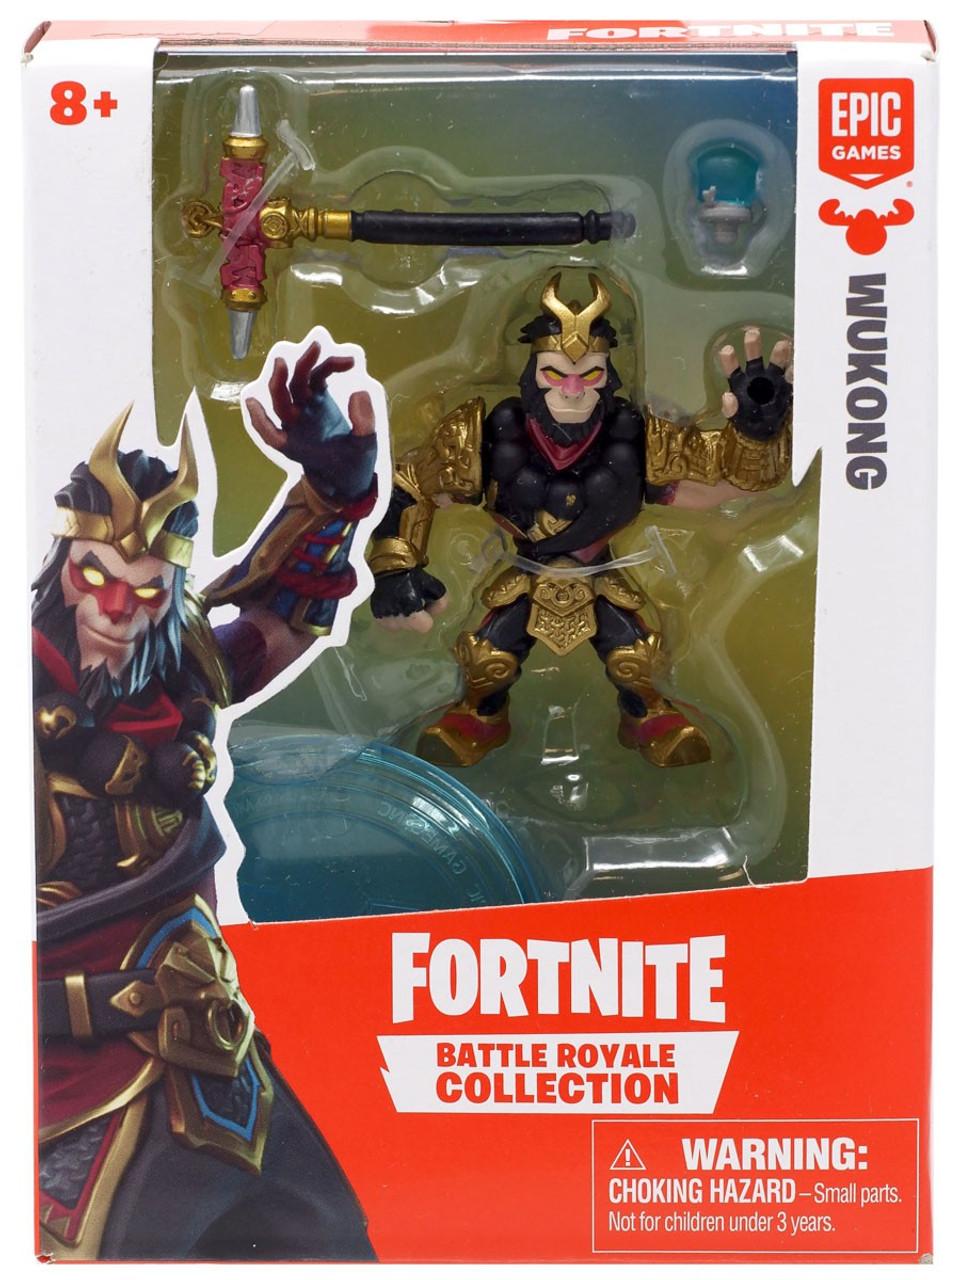 White Sushi Fortnite Loadout Fortnite Epic Games Battle Royale Collection Wukong 2 Mini Figure Moose Toys Toywiz